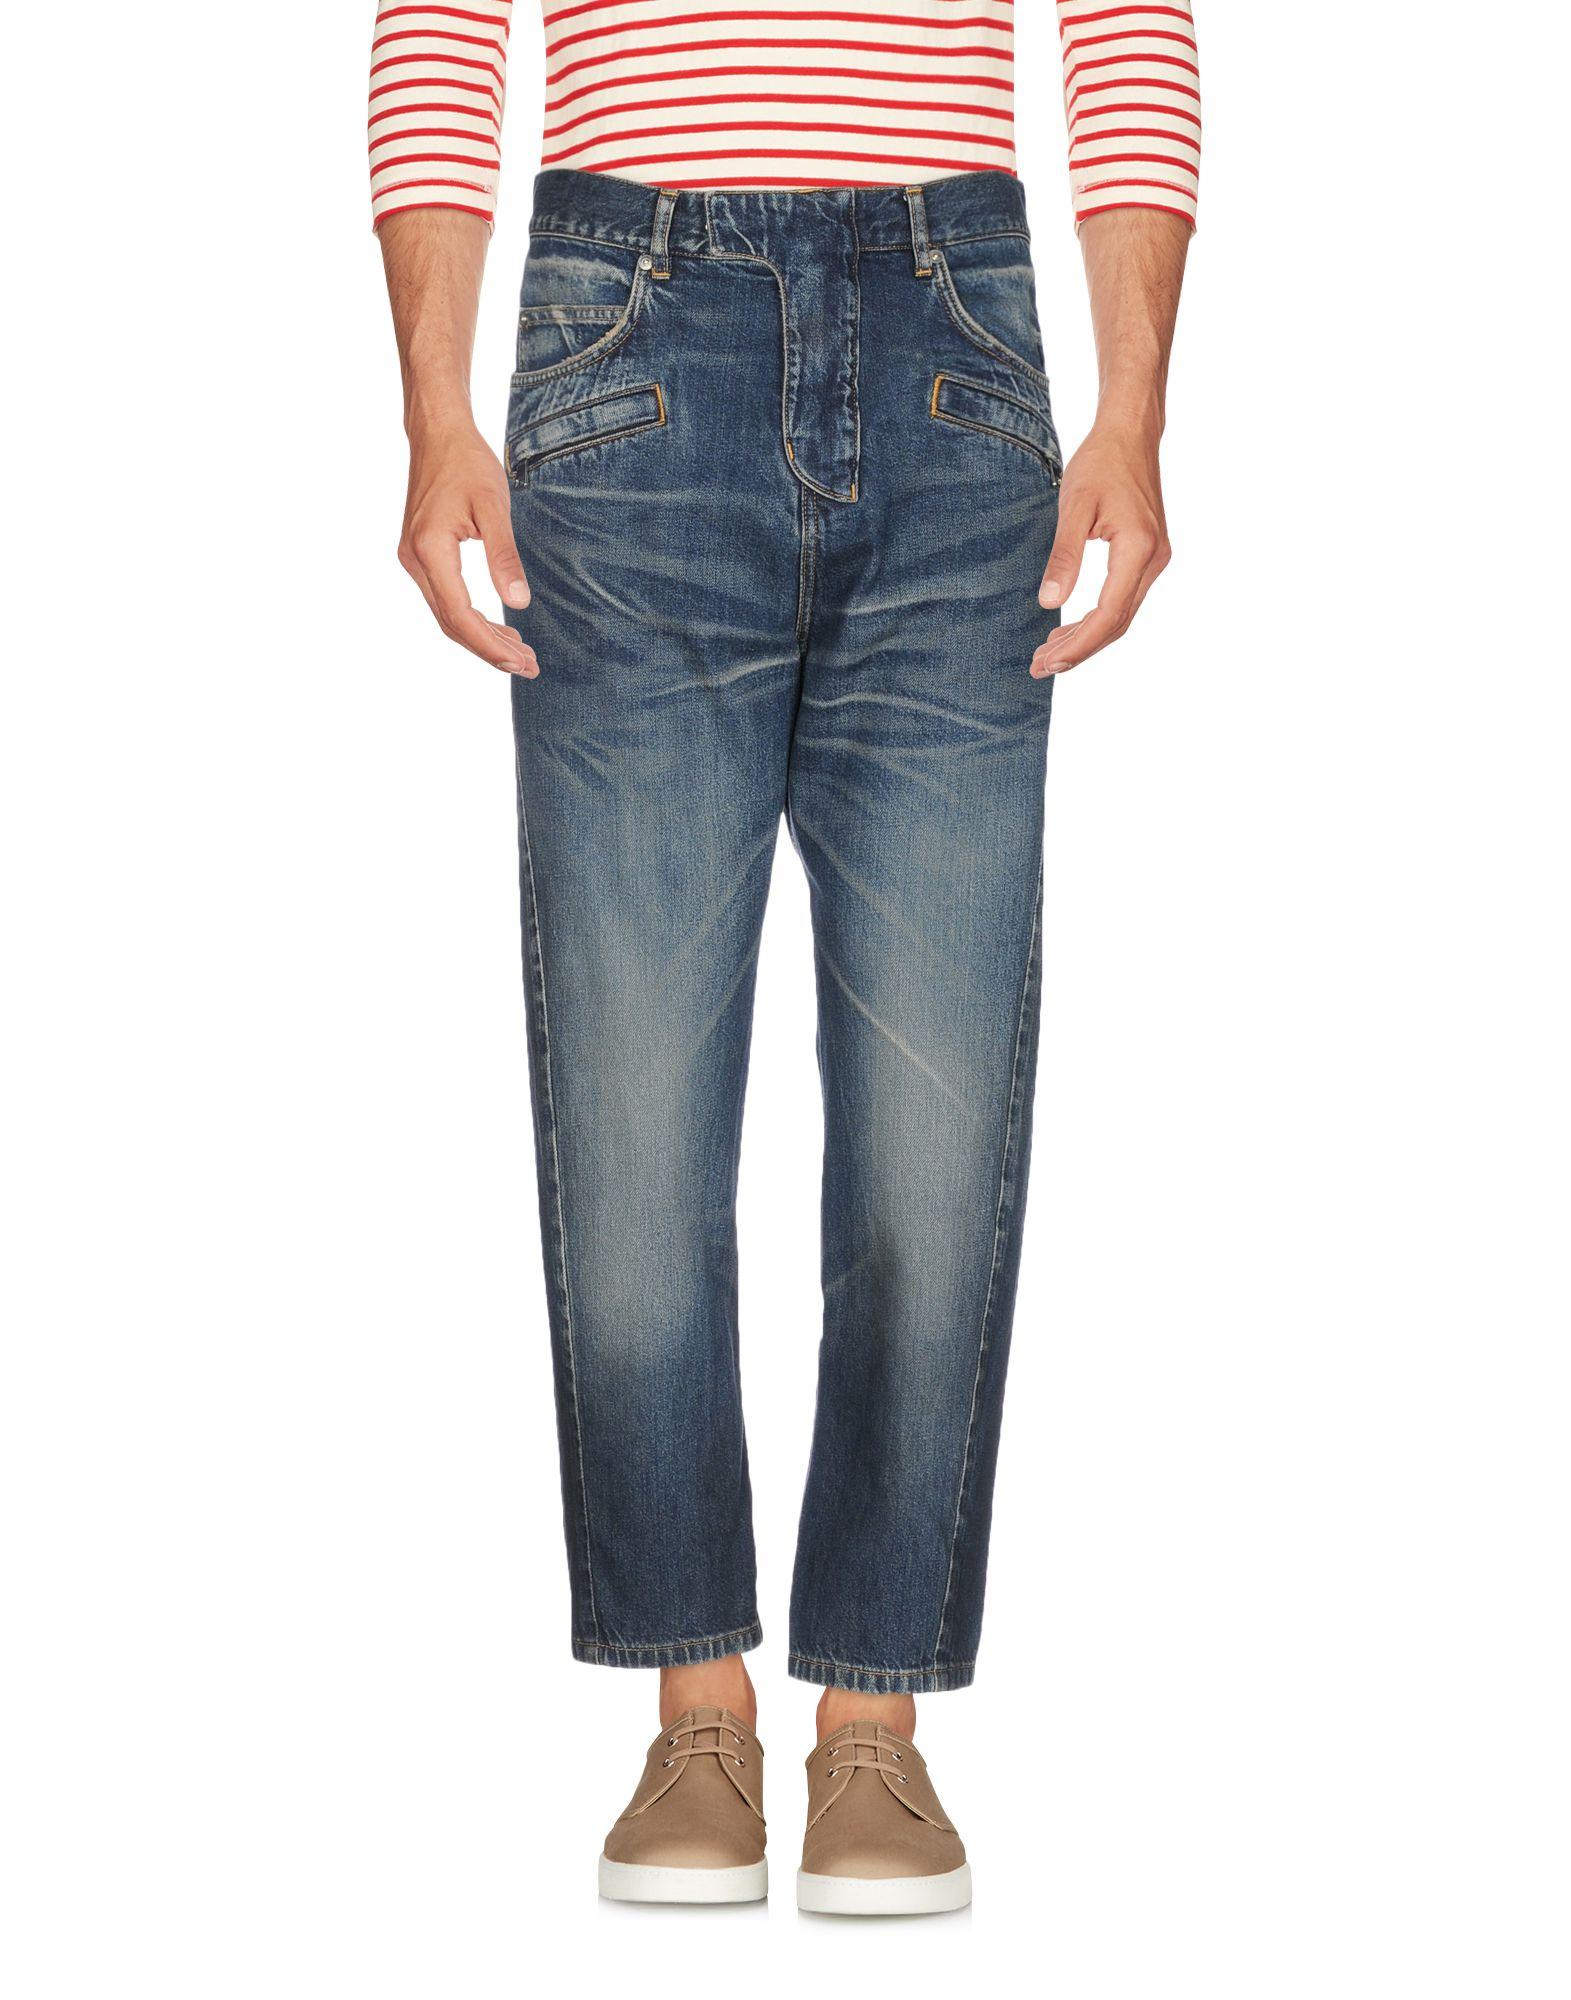 Pantaloni Jeans Balmain Uomo - Acquista online su